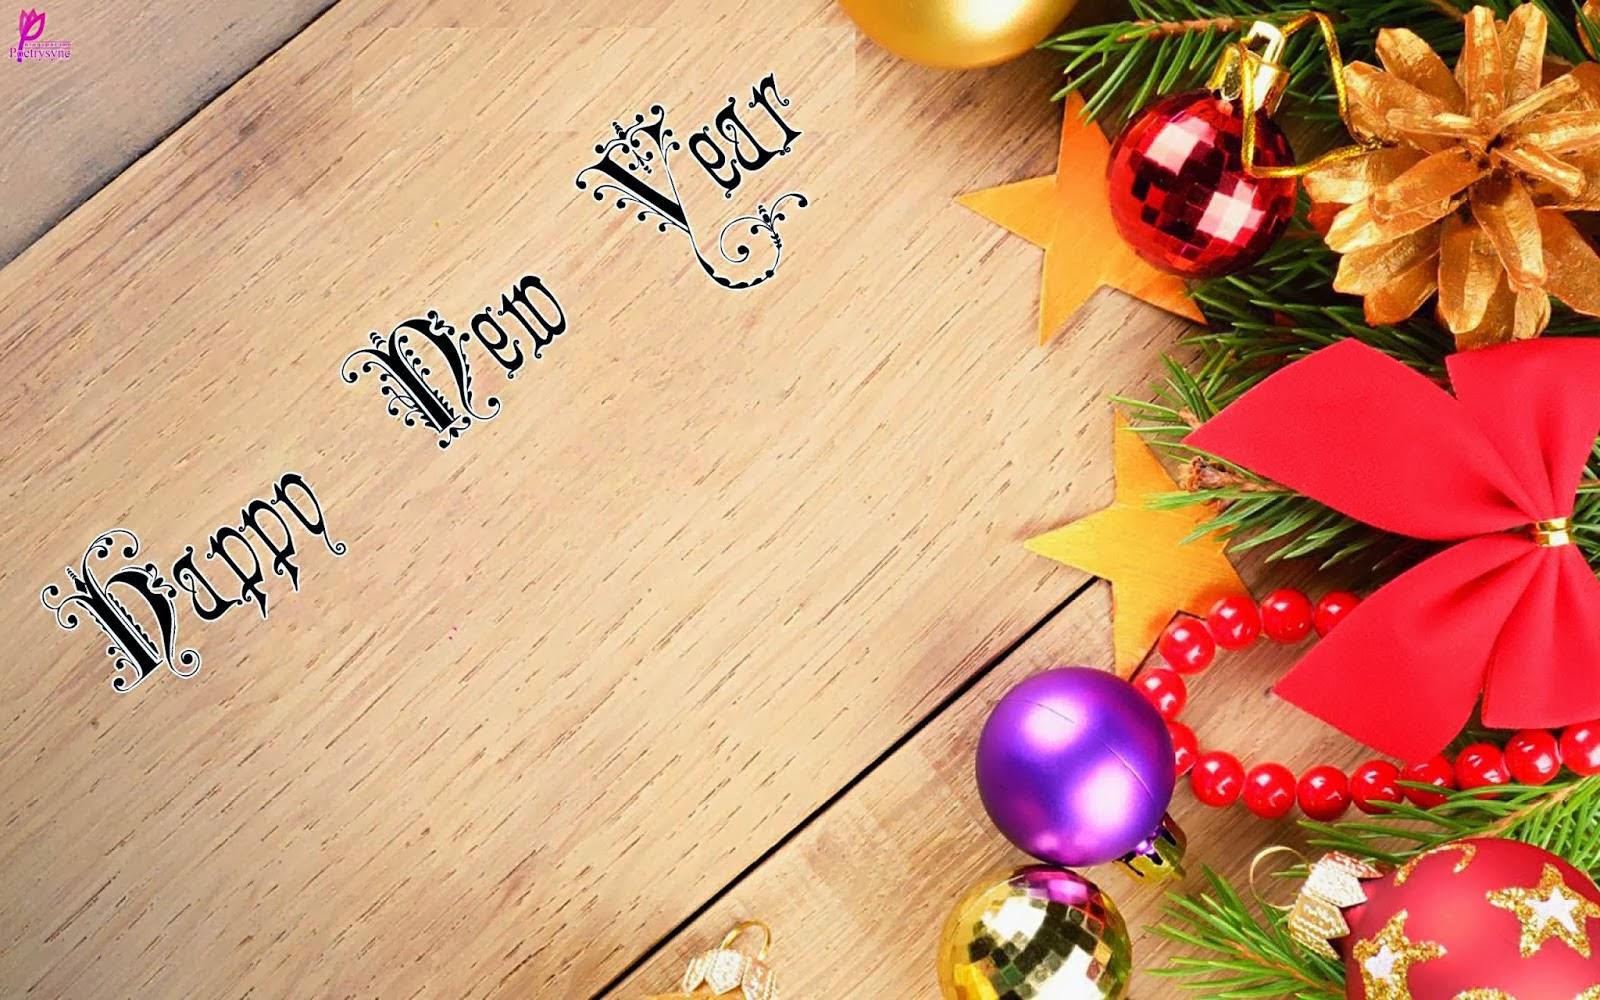 polite shayari love sms sms funny sms my jaanu happy new year 2014